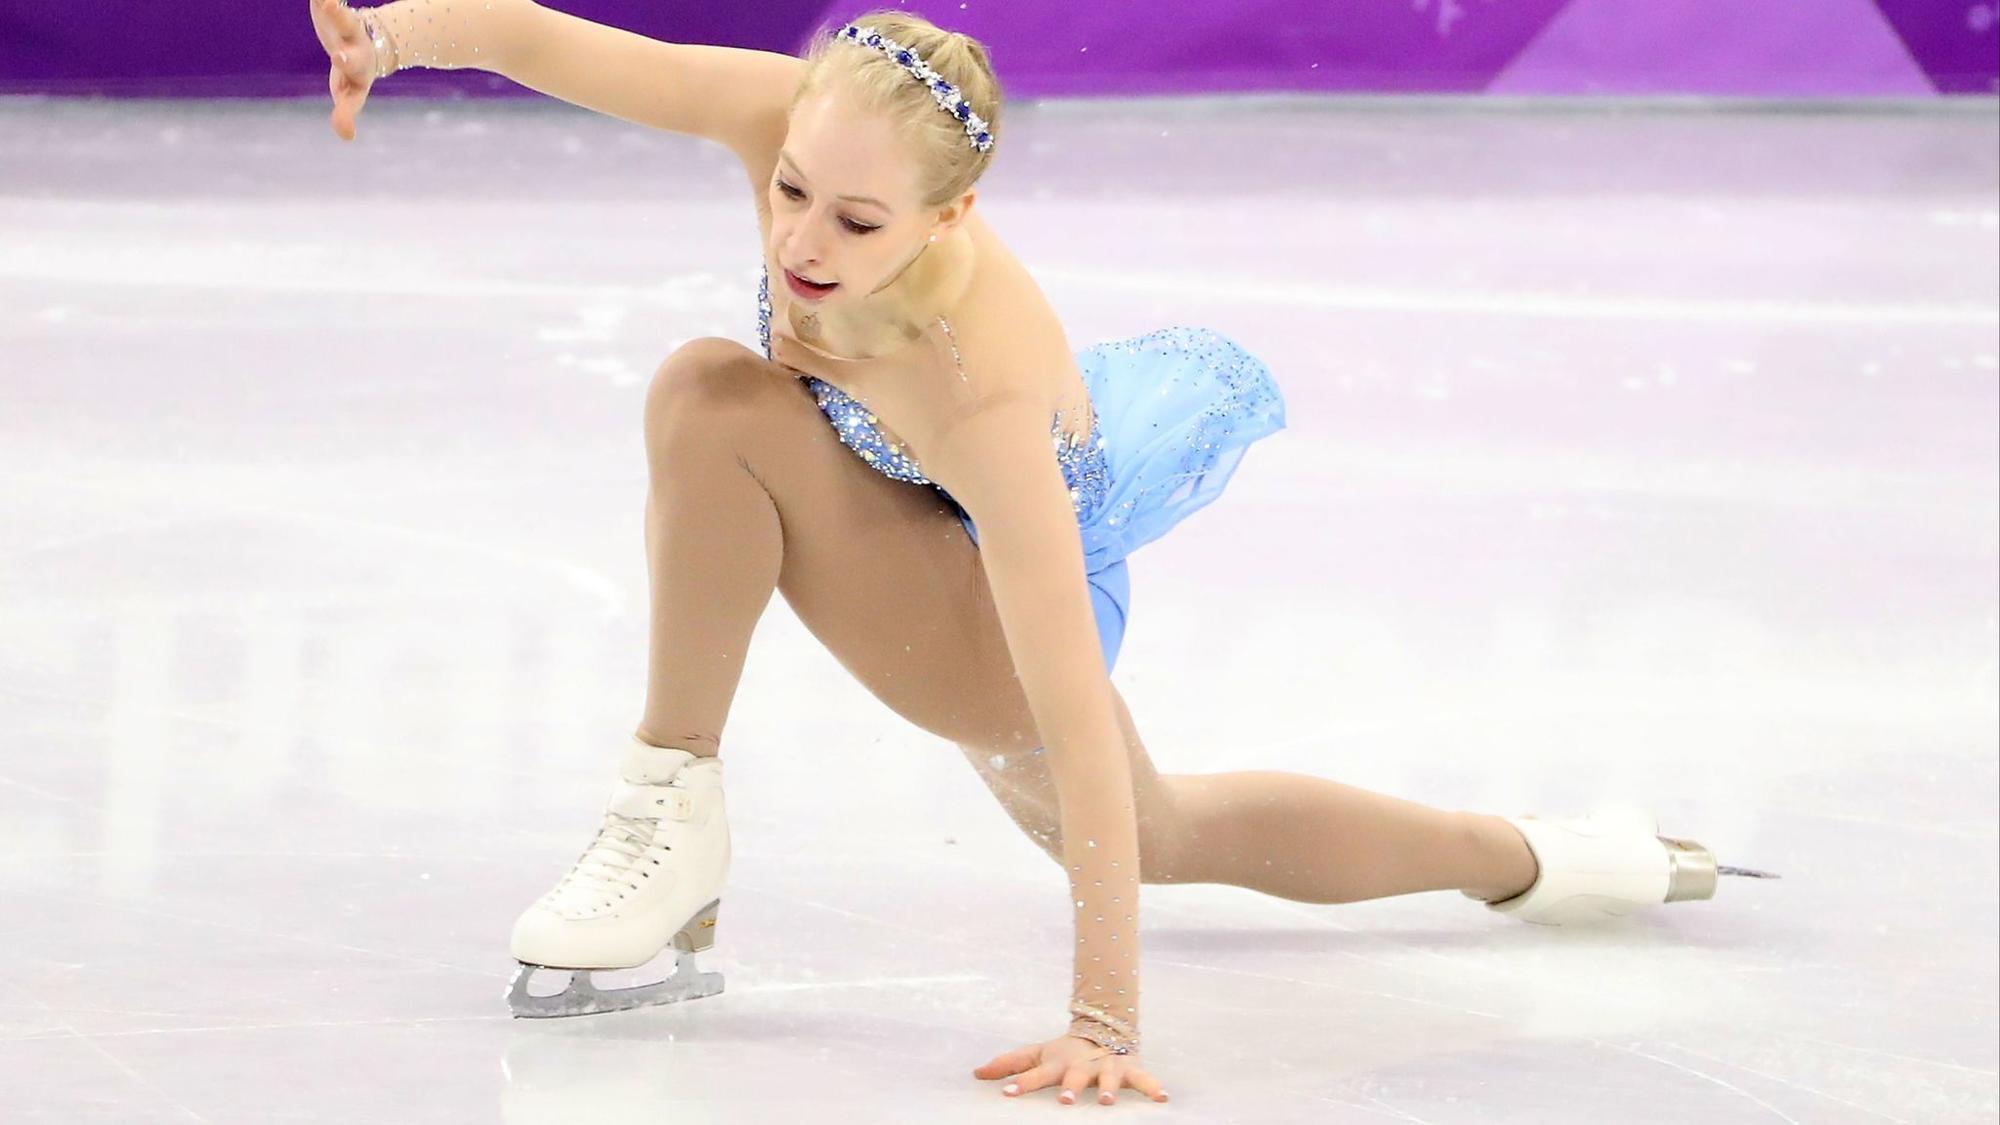 Unforgettable U S Olympic Female Figure Skaters: Dismal Showing For U.S. Female Figure Skaters